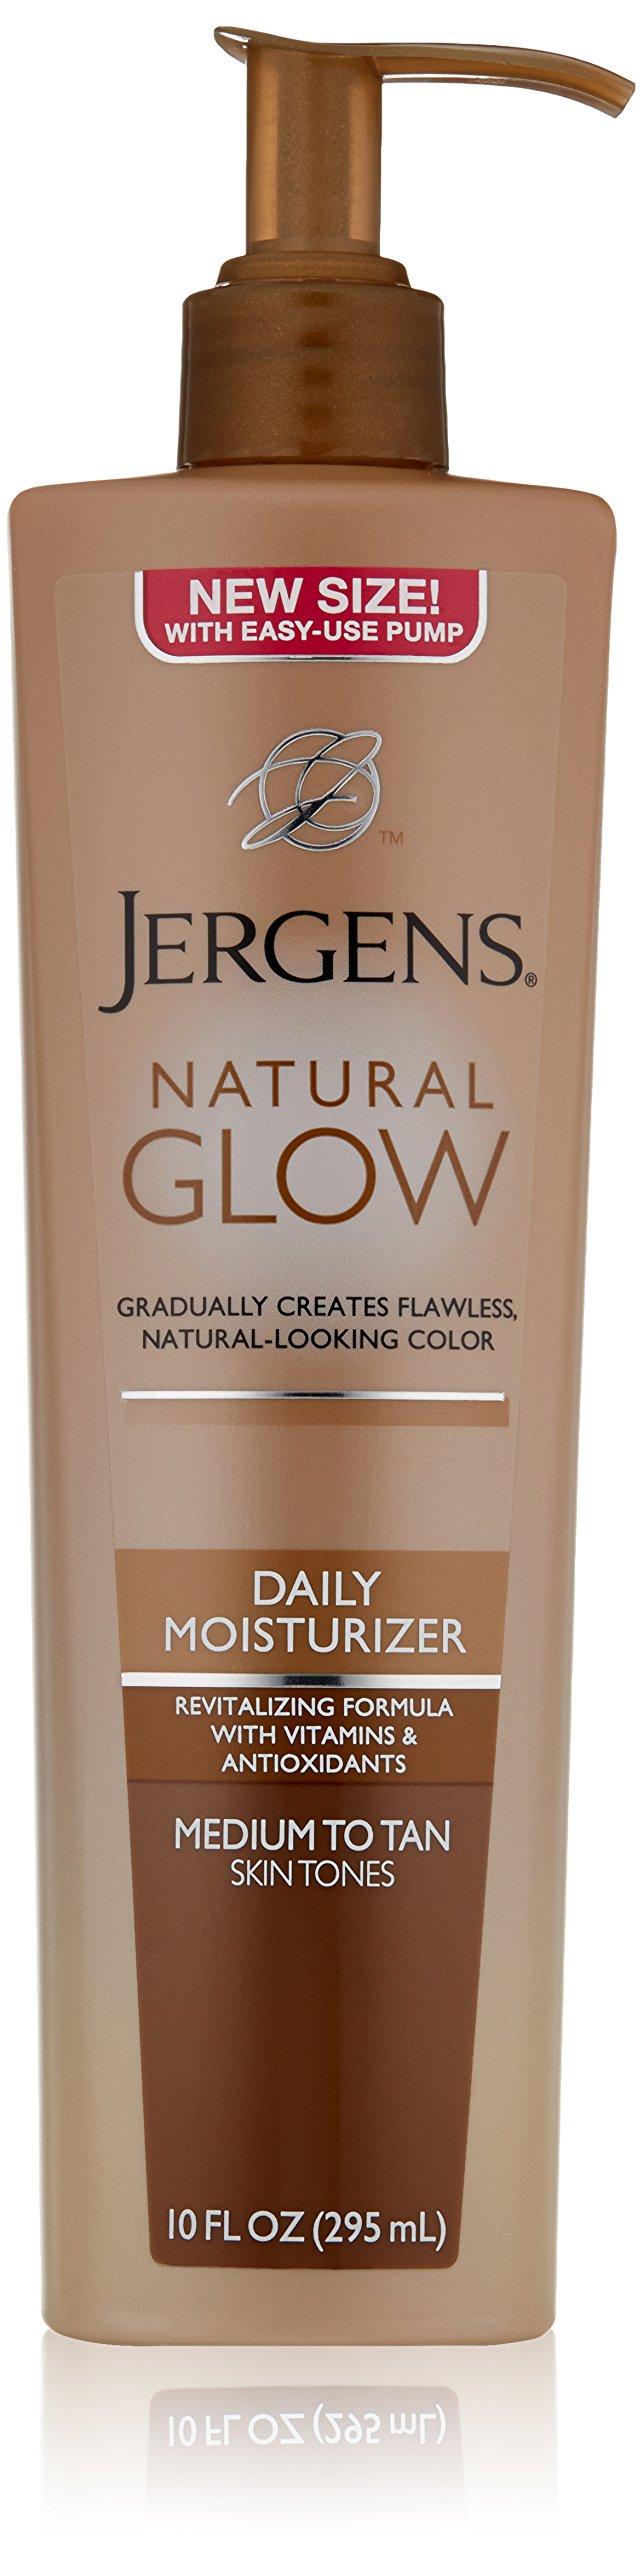 Jergens Natural Glow Daily Moisturizer, Medium to Tan Skin Tones, 10 Ounce Pump